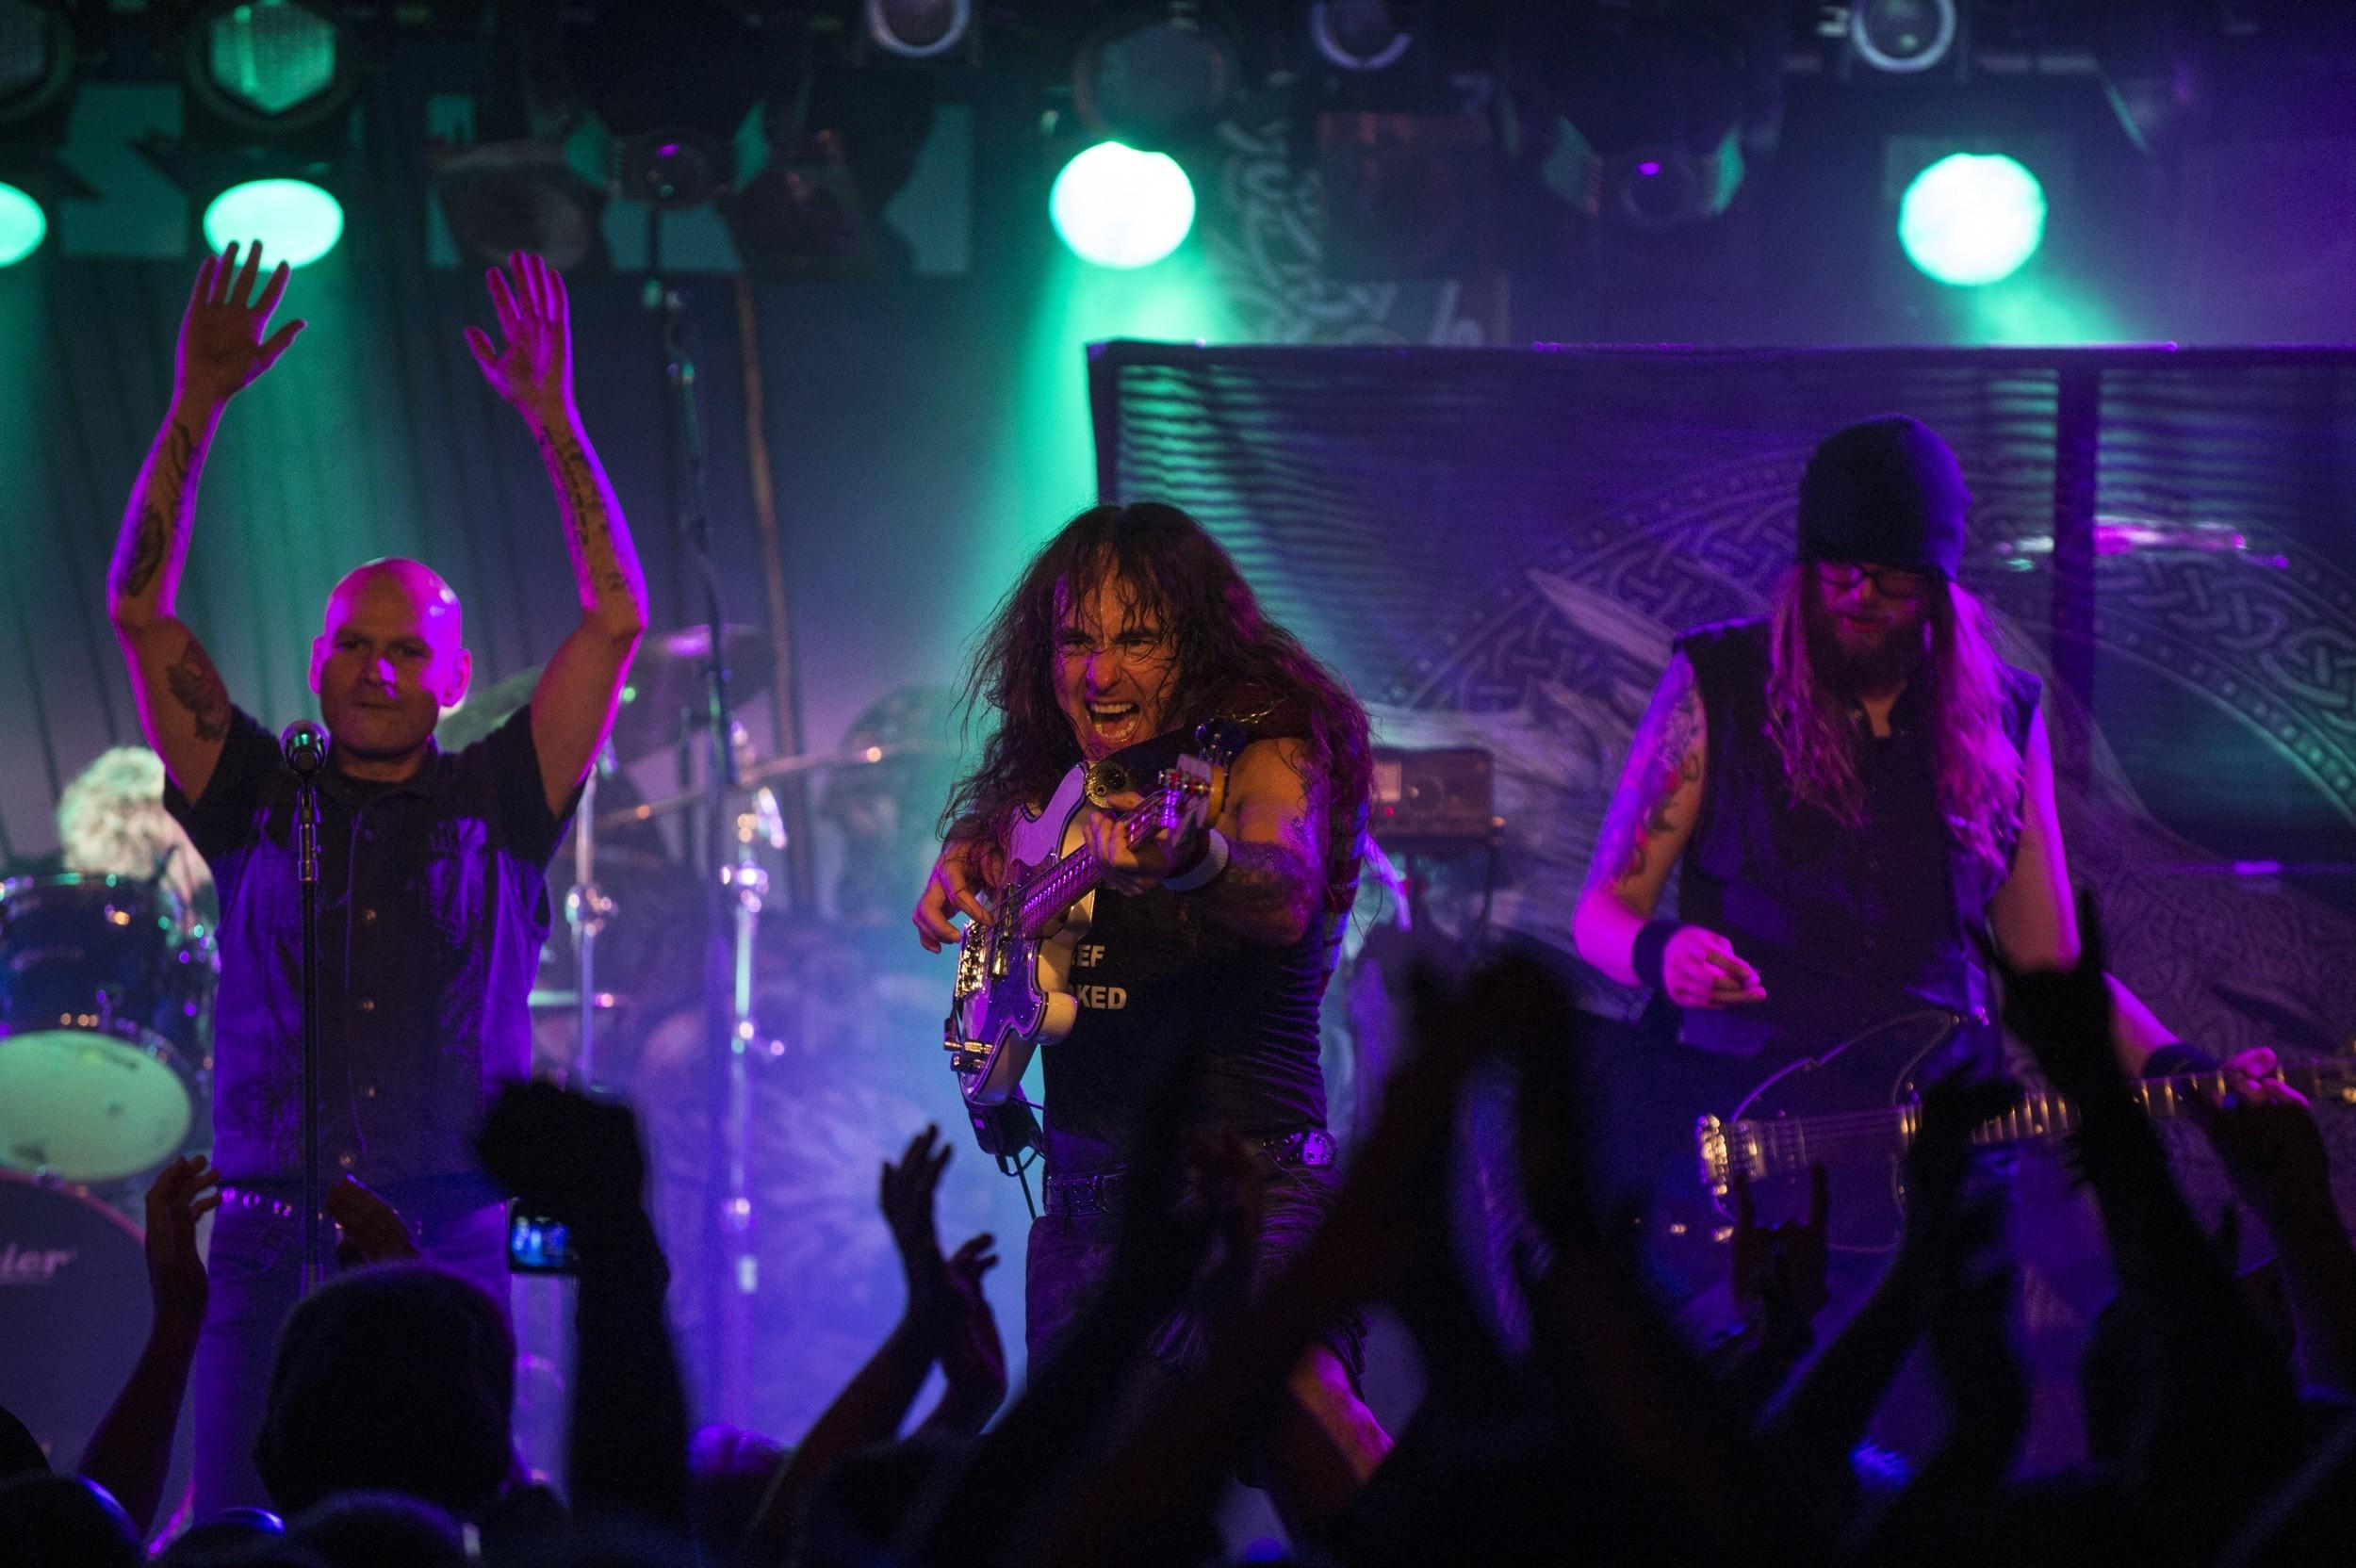 O projeto British Lion, do baixista Steve Harris, do Iron Maiden